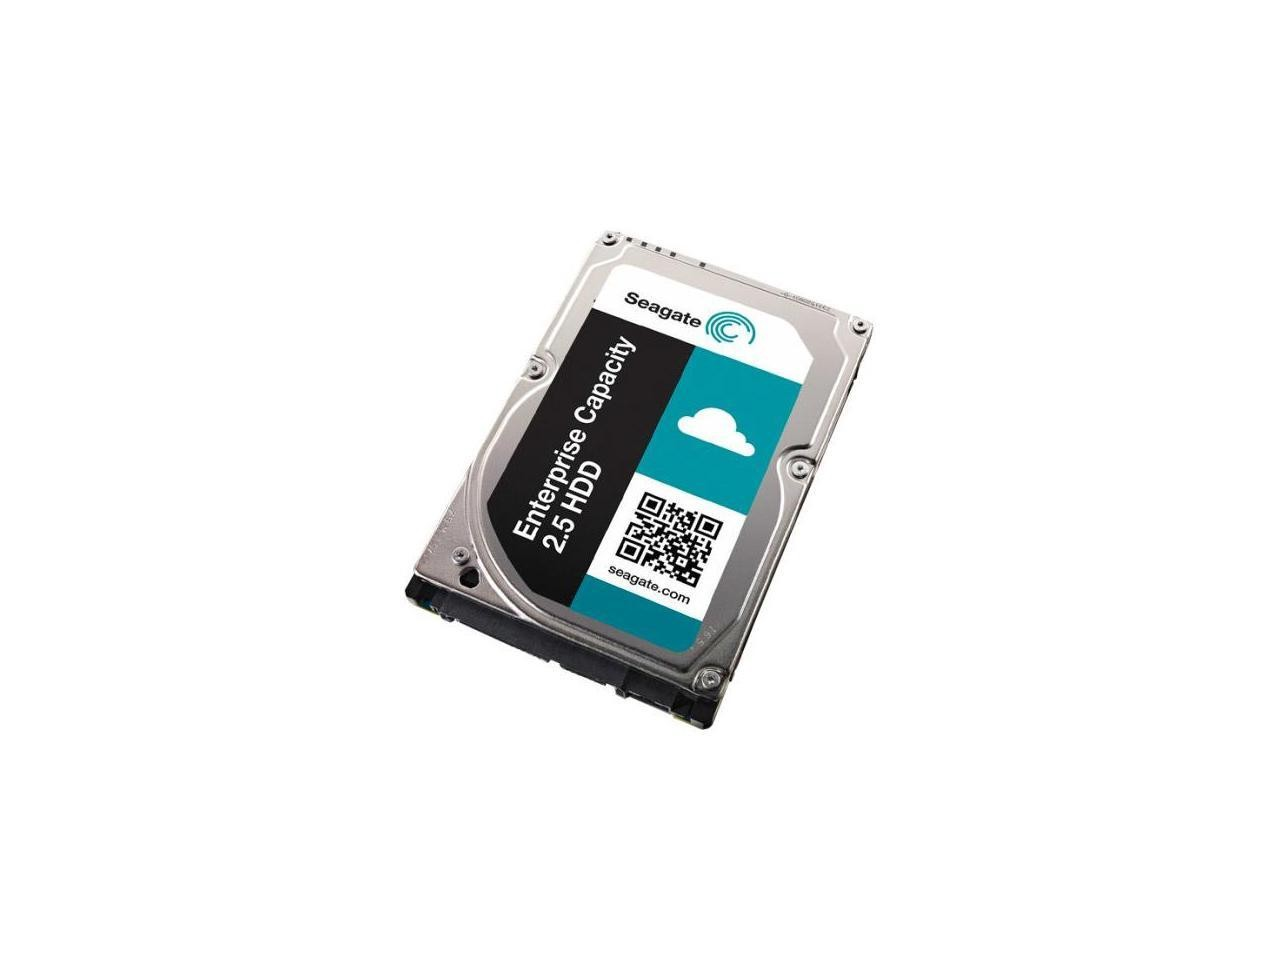 Seagate 1TB ST1000NX0323 7200RPM Sas 12GB/s 2.5 Internal Hdd